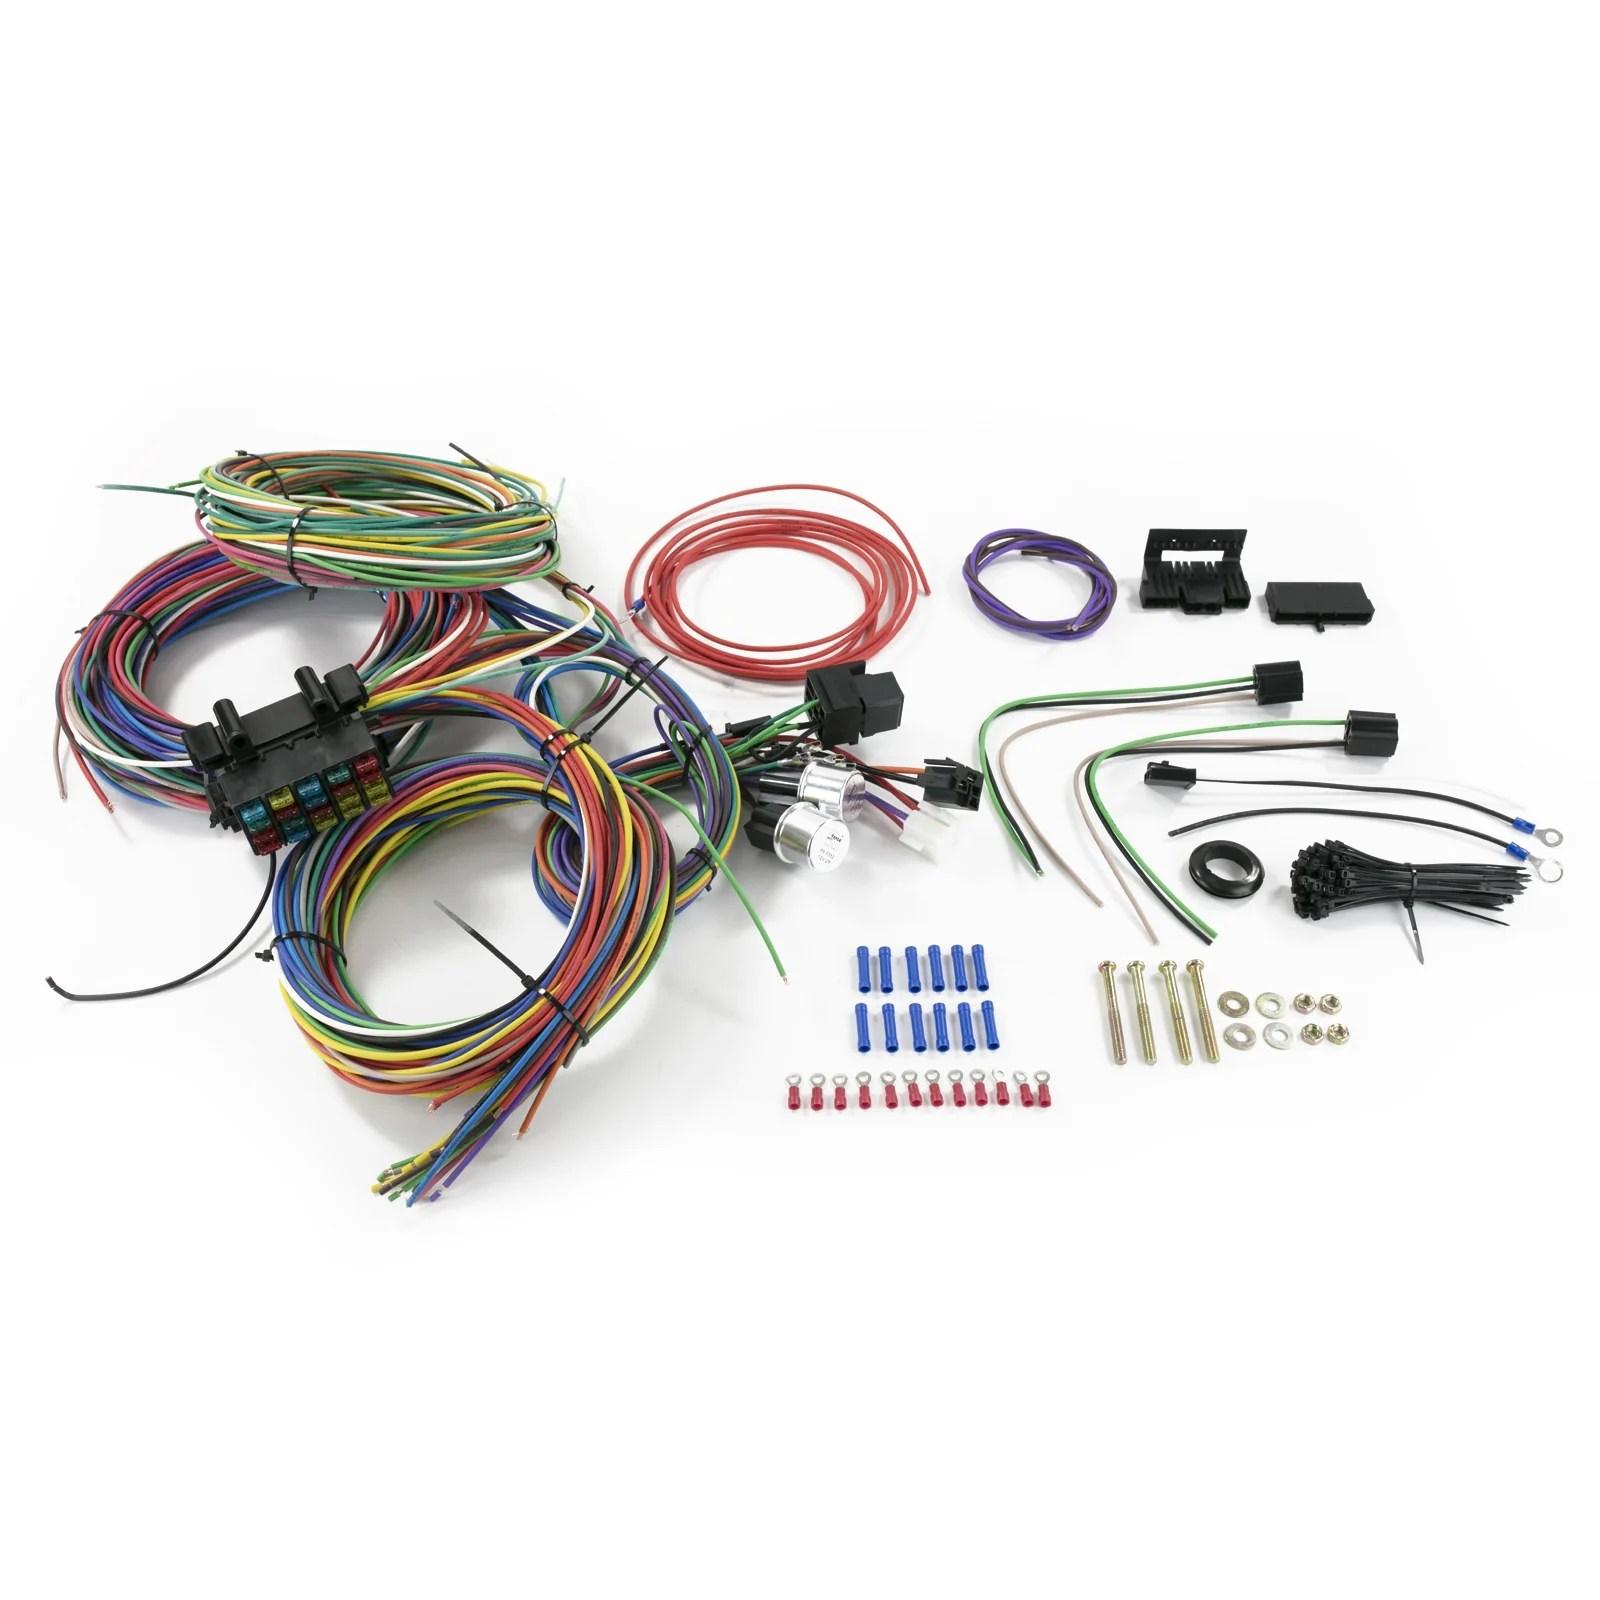 medium resolution of wiring harness universal 240z 260z 280z 510 z car depot 280z ez wiring harness 280z wiring harness